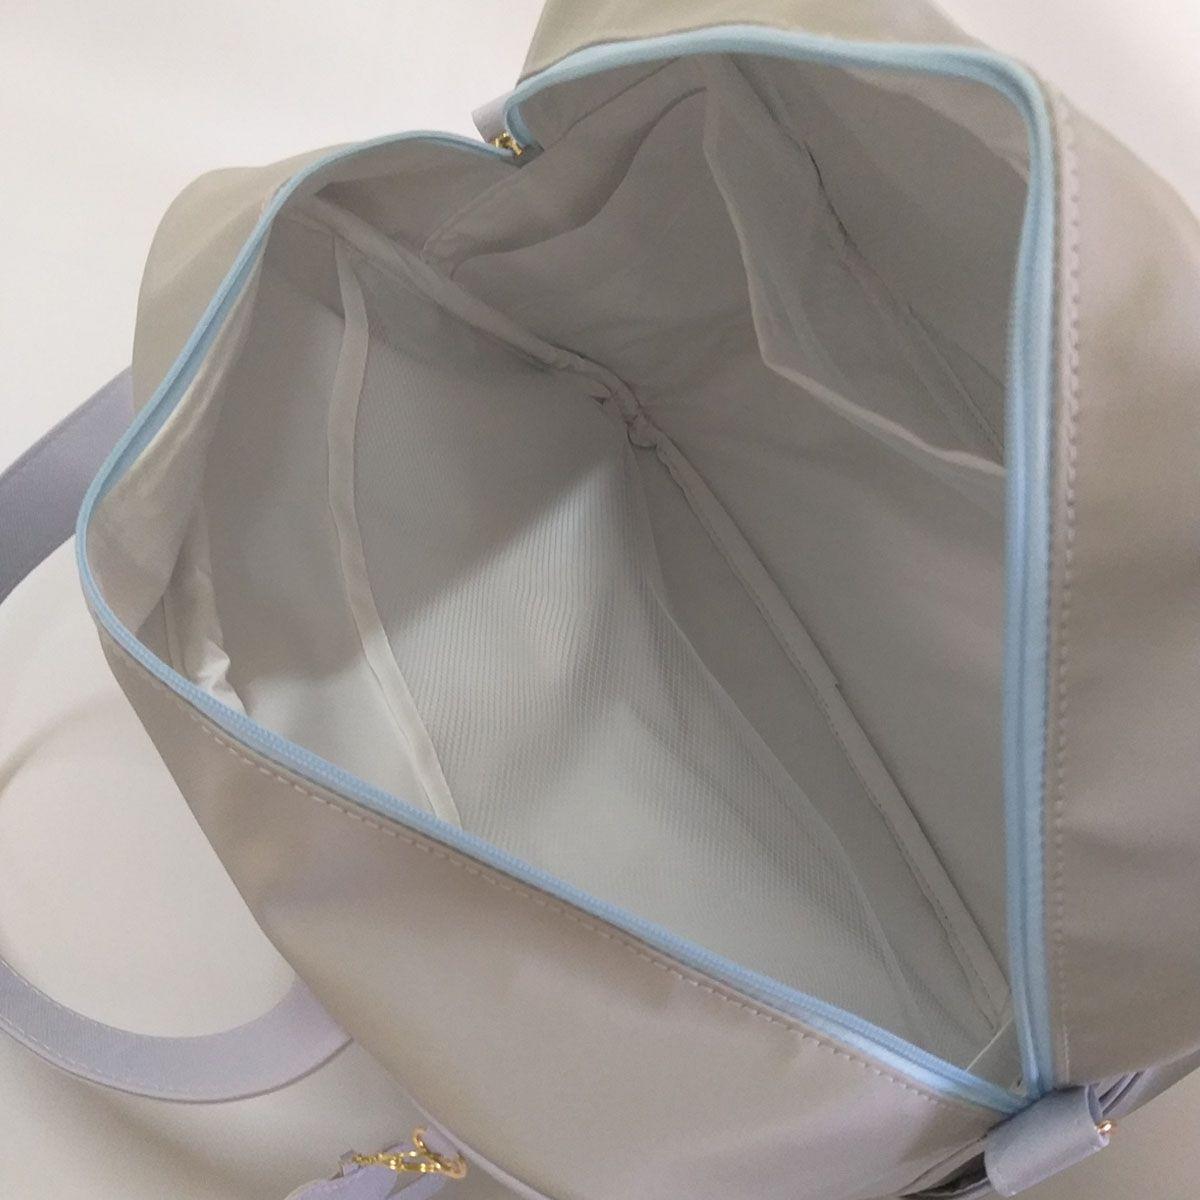 Kit Mala Maternidade + Bolsa P Matelasse Cinza com Azul